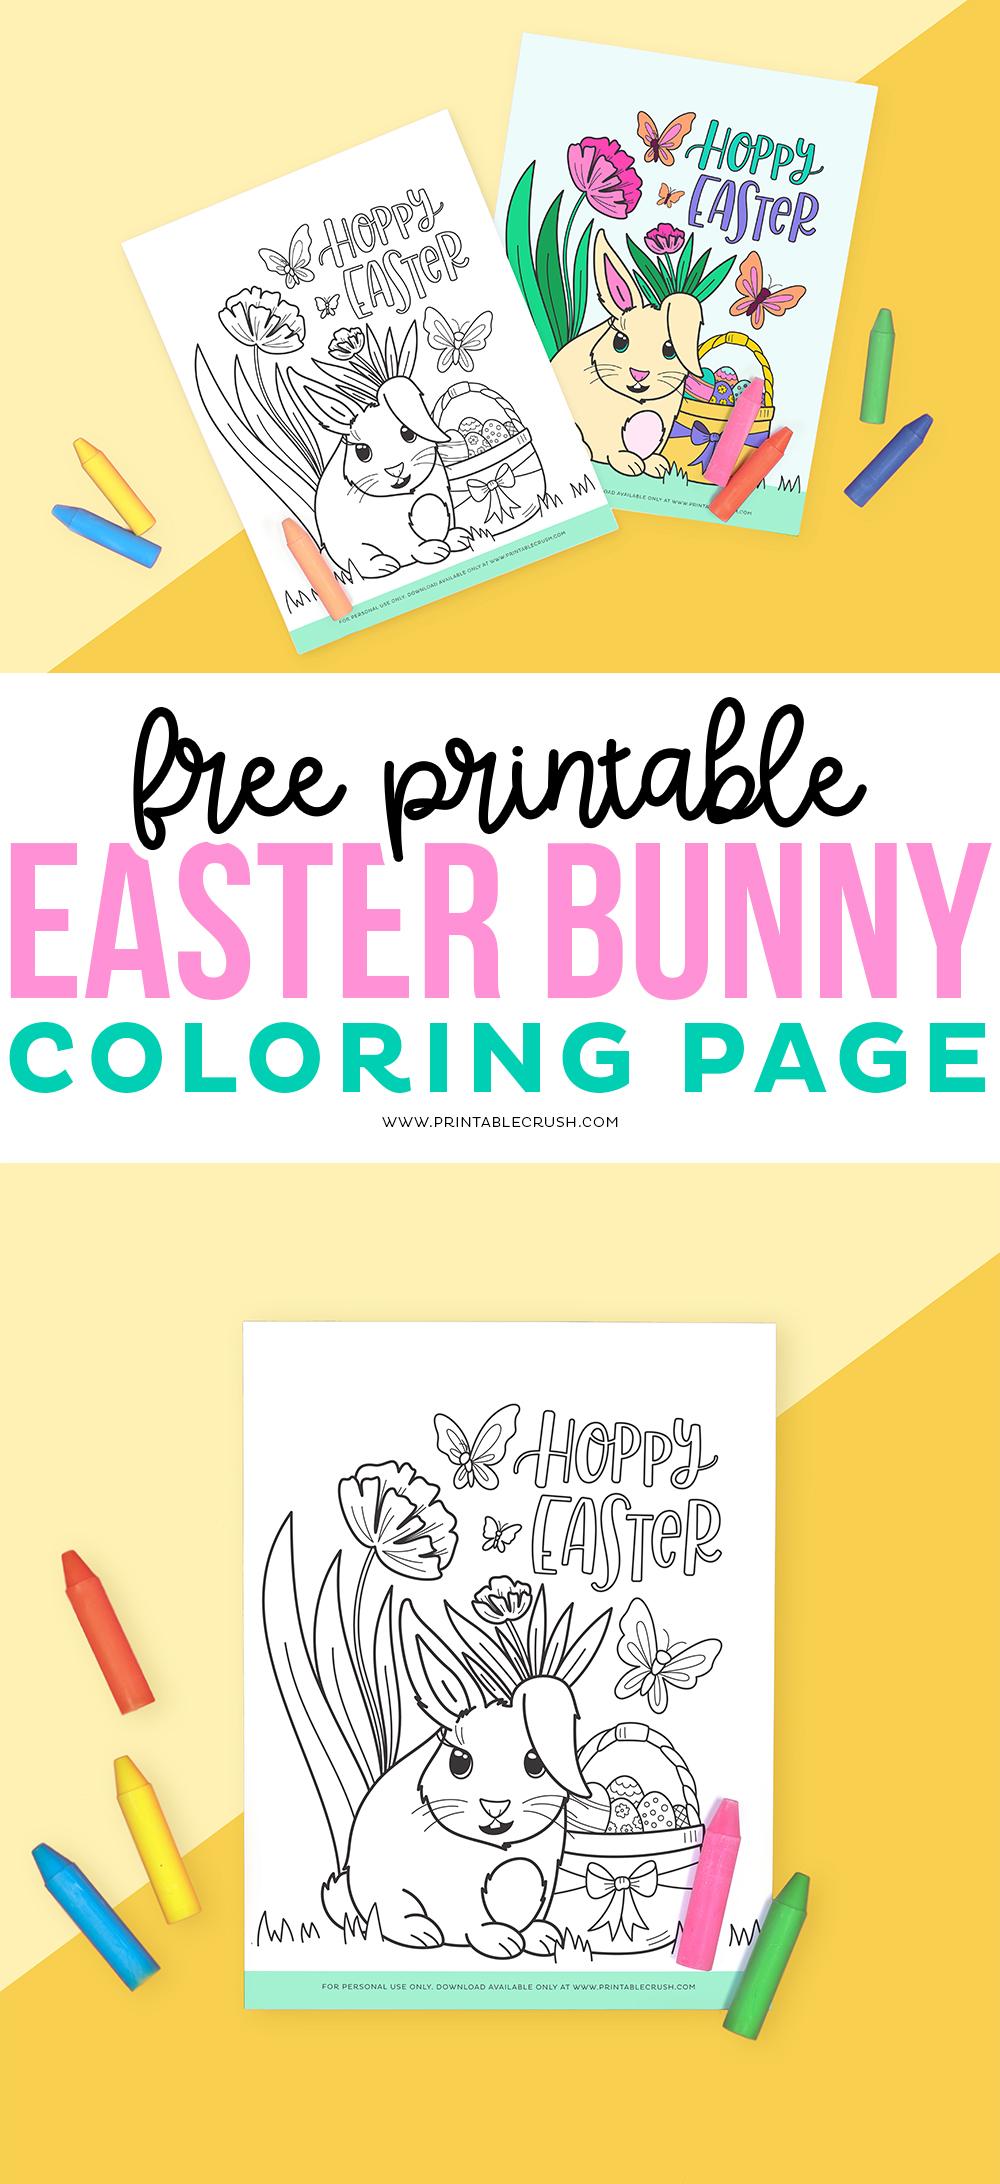 Free Printable Coloring Page for Easter - Free Easter Coloring Page Printable - Printable Crush #easter #easterprintable #easterbunny #eastercoloringpage #easterbunnycoloringpage #printablecoloringpage via @printablecrush